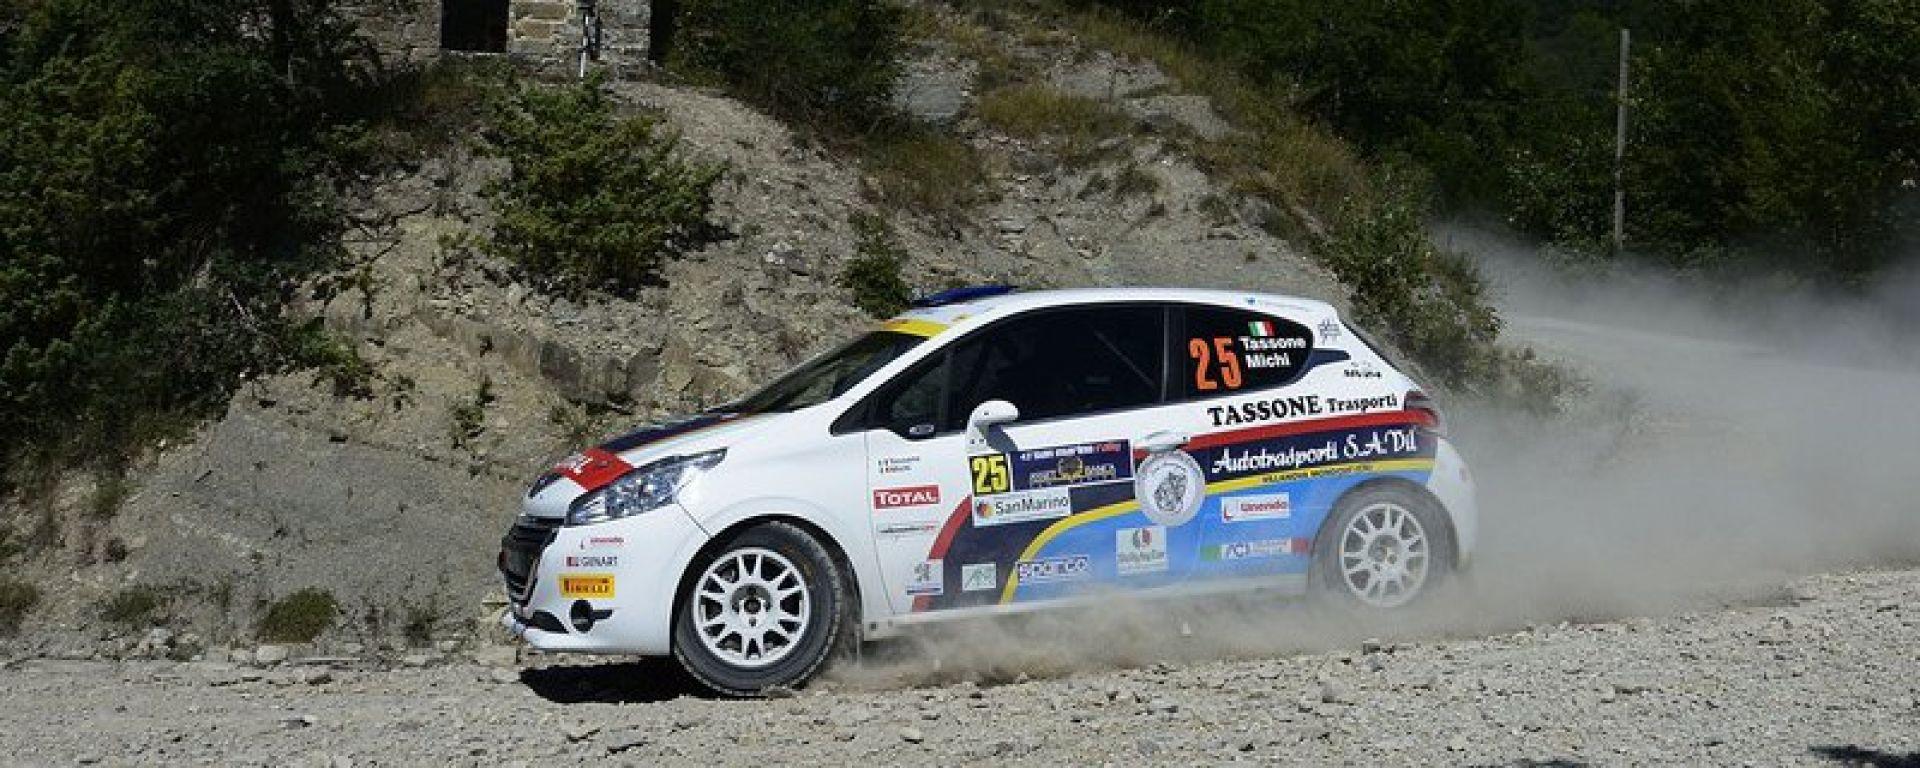 Rally San Marino 2016 - Info e Risultati